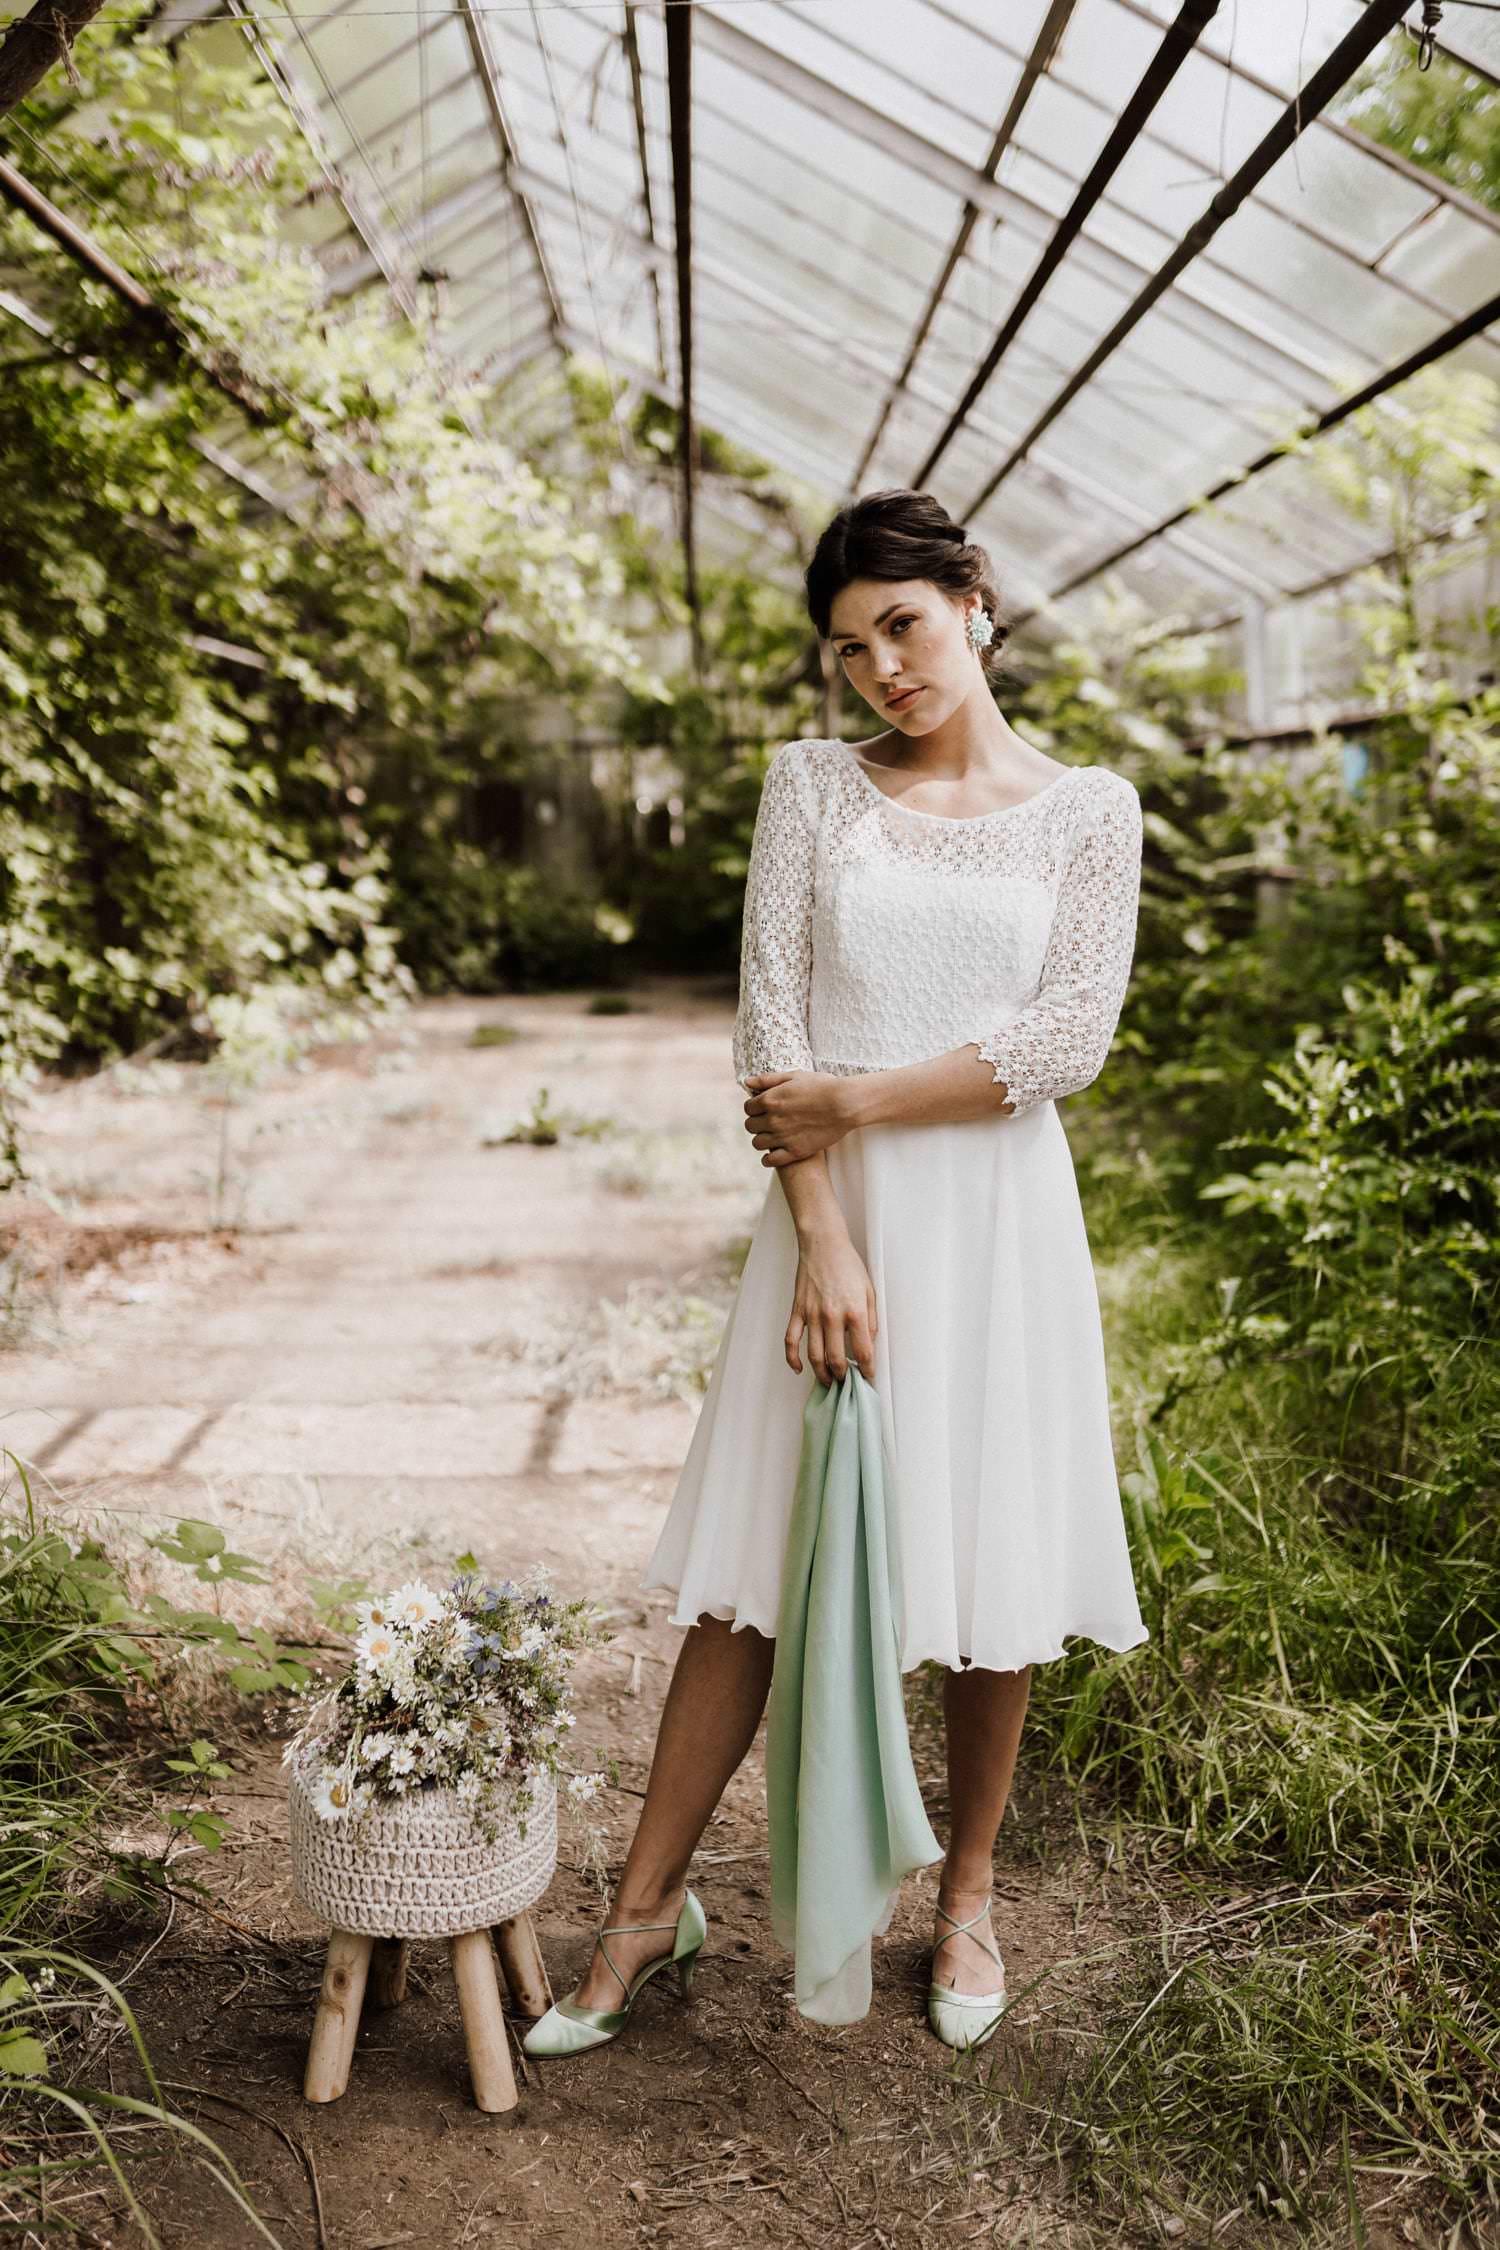 Brautkleid-kurz-Ärmel-Boho